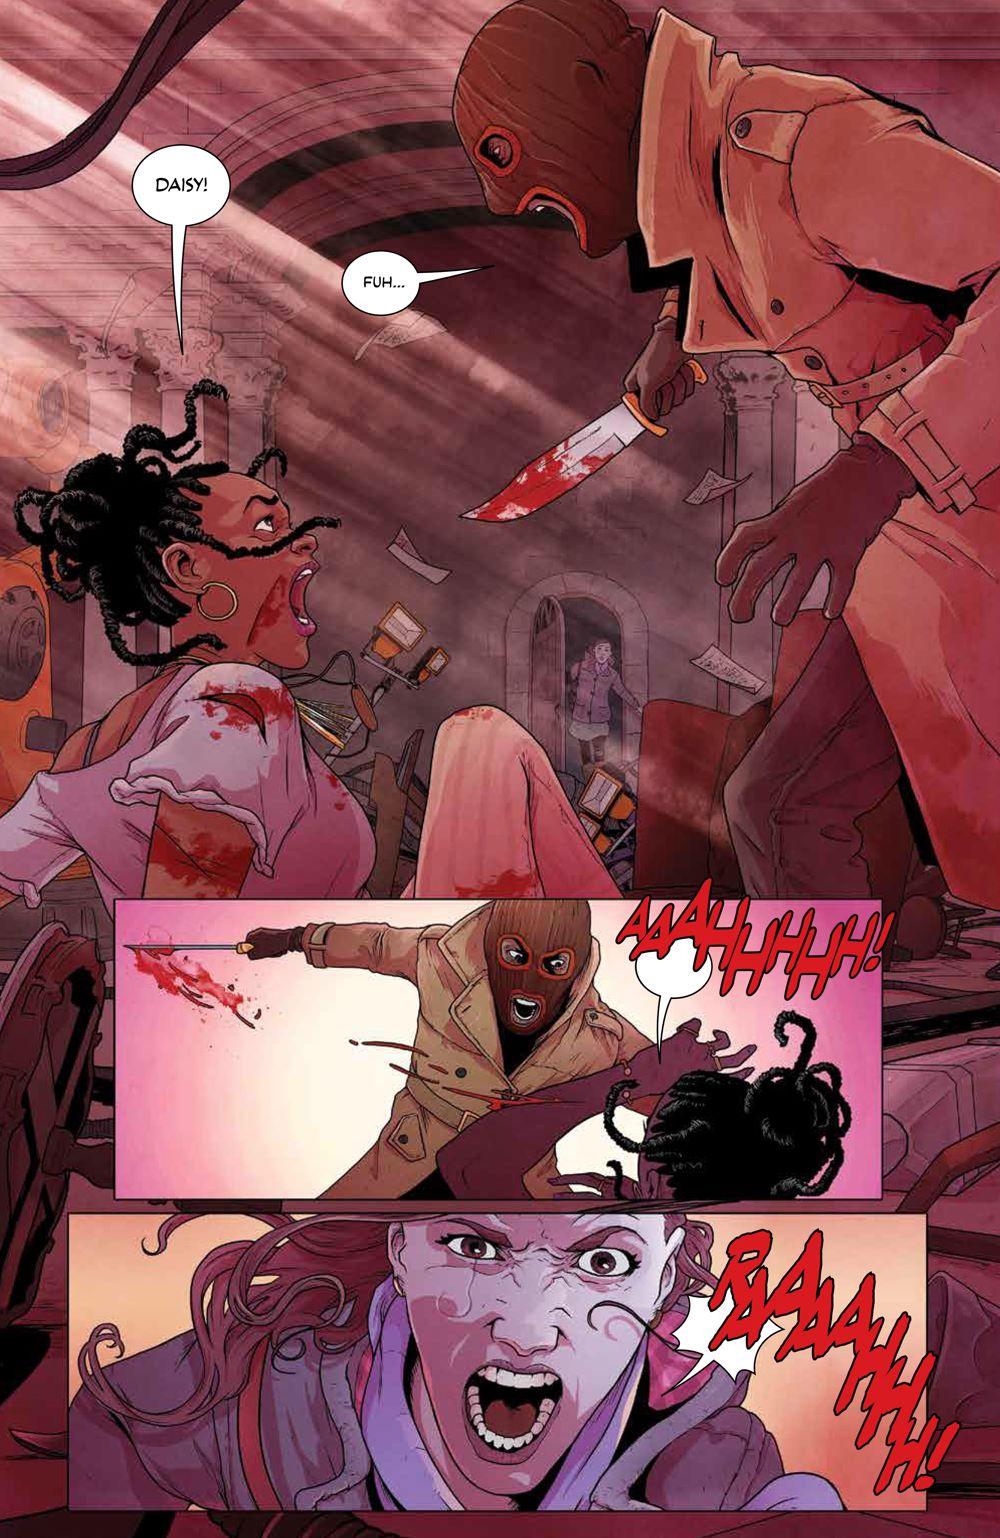 RedMother_v3_SC_PRESS_11 ComicList Previews: RED MOTHER VOLUME 3 TP